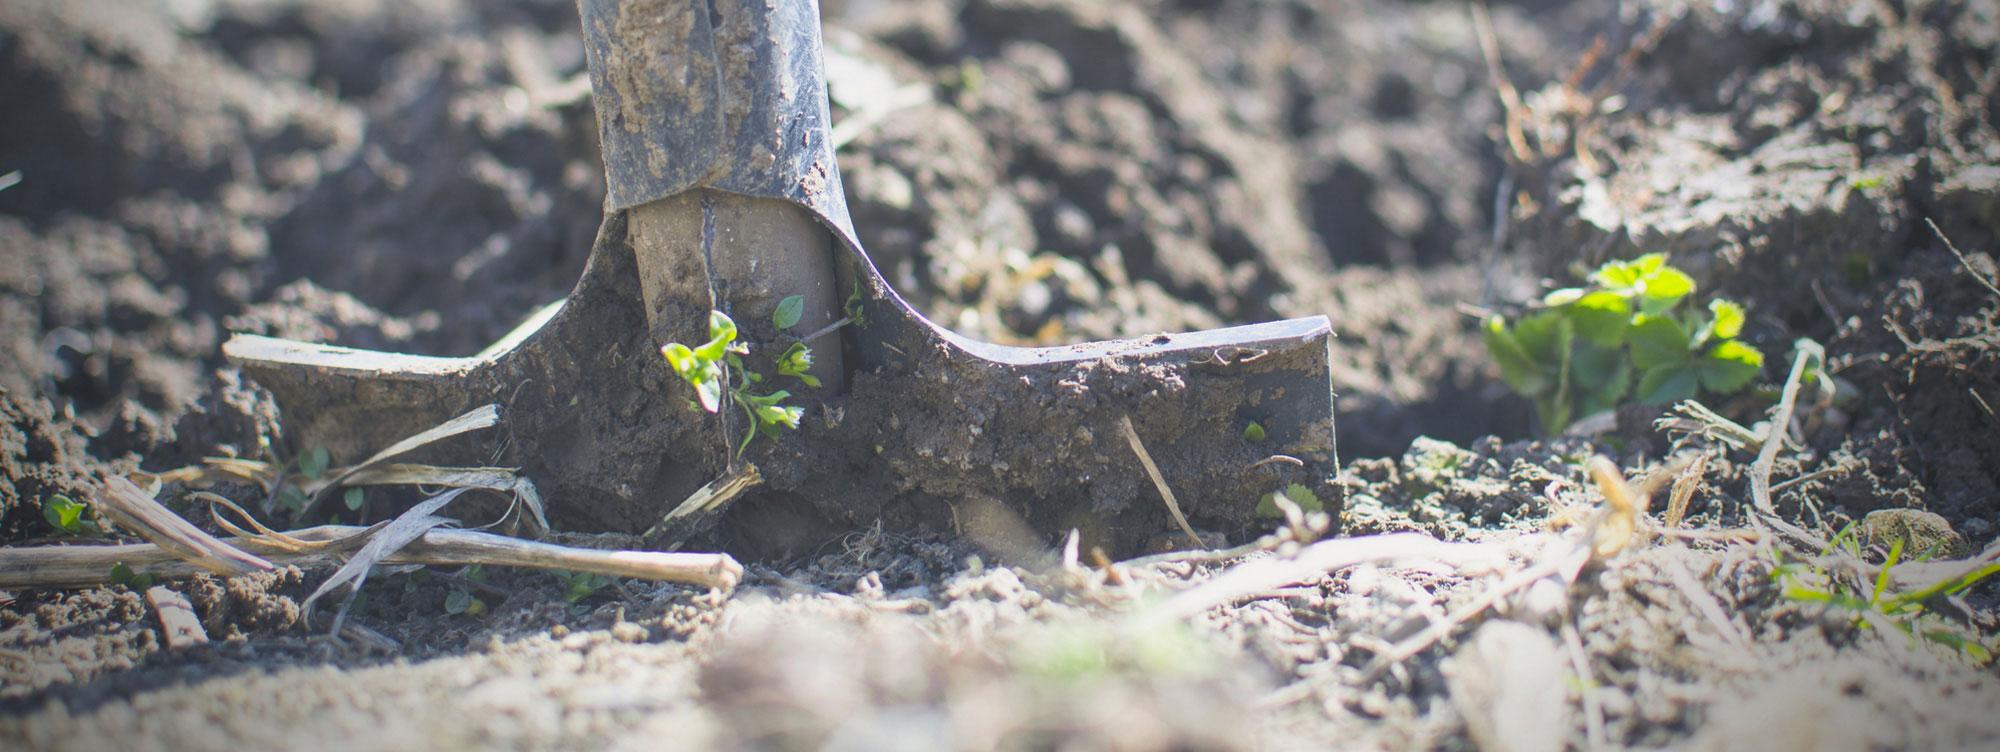 Agricolus – The platform for precision farming